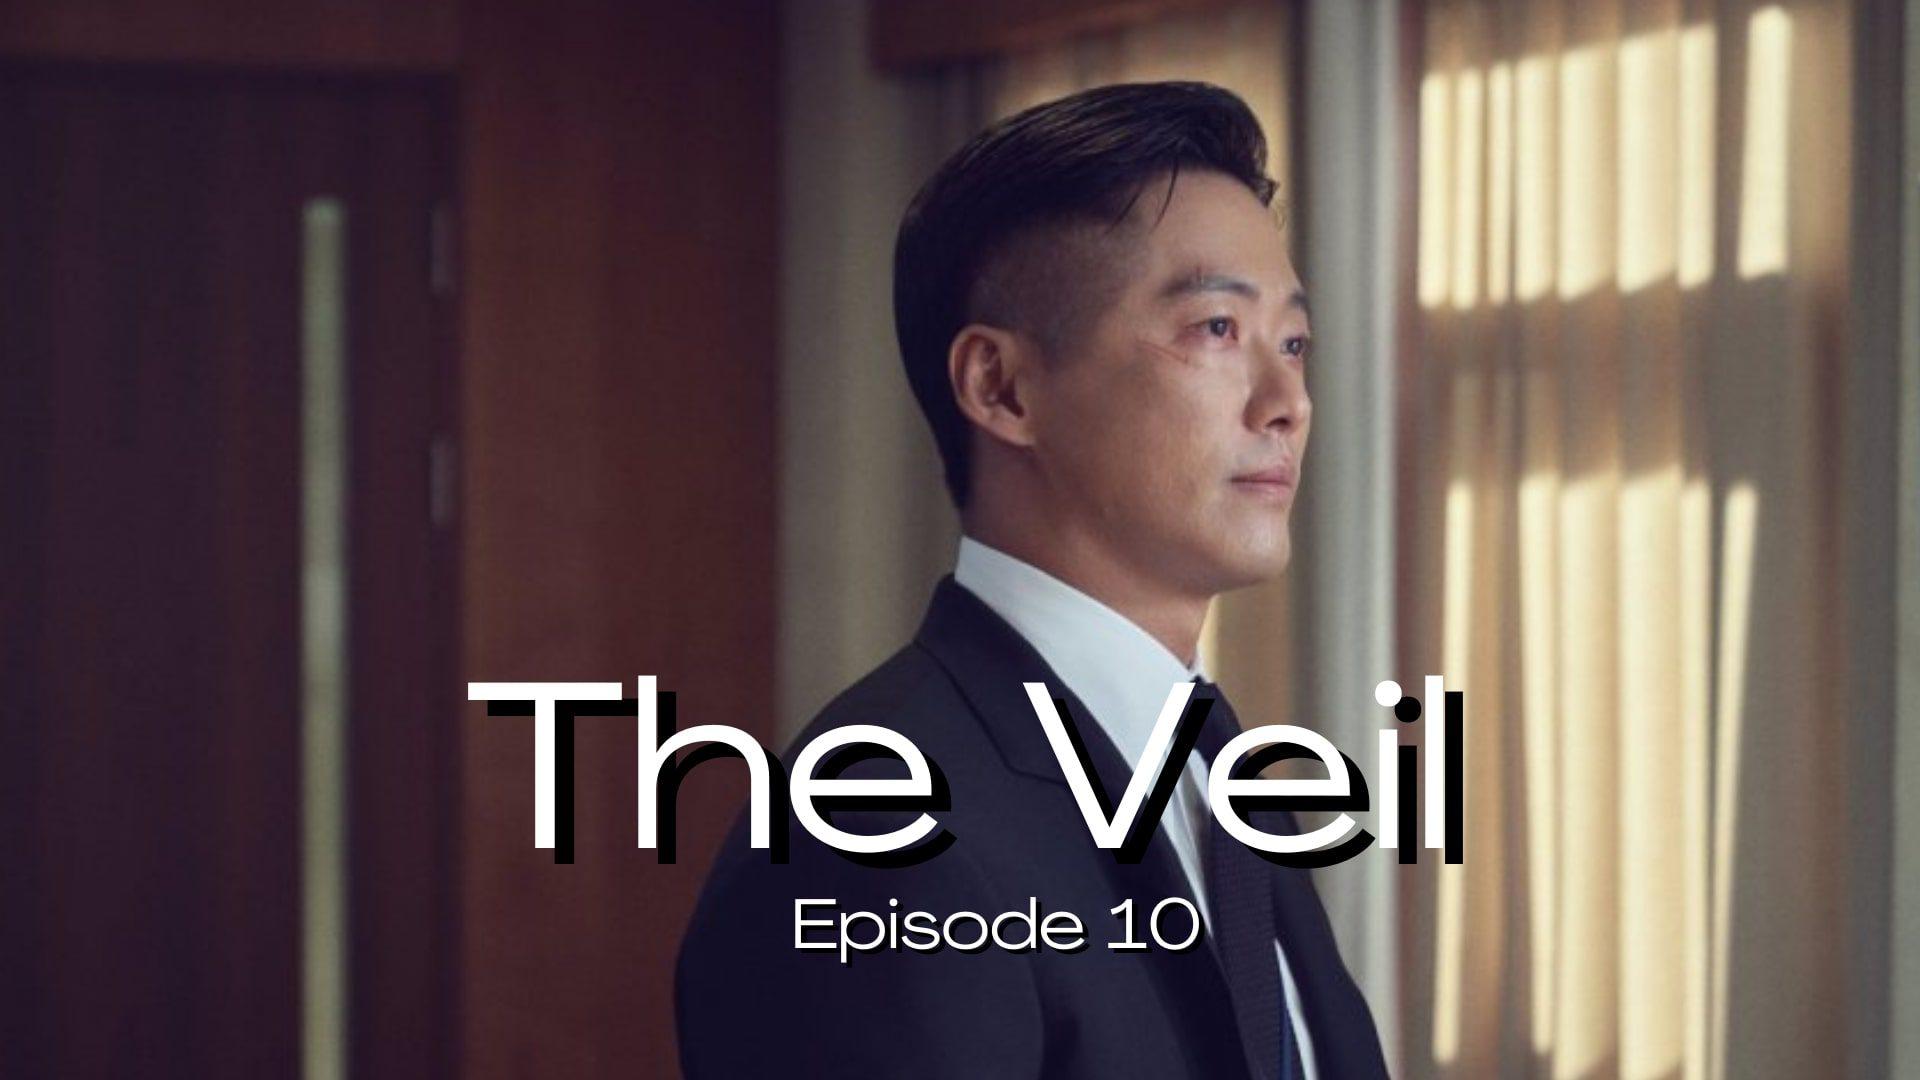 The Veil Episode 10